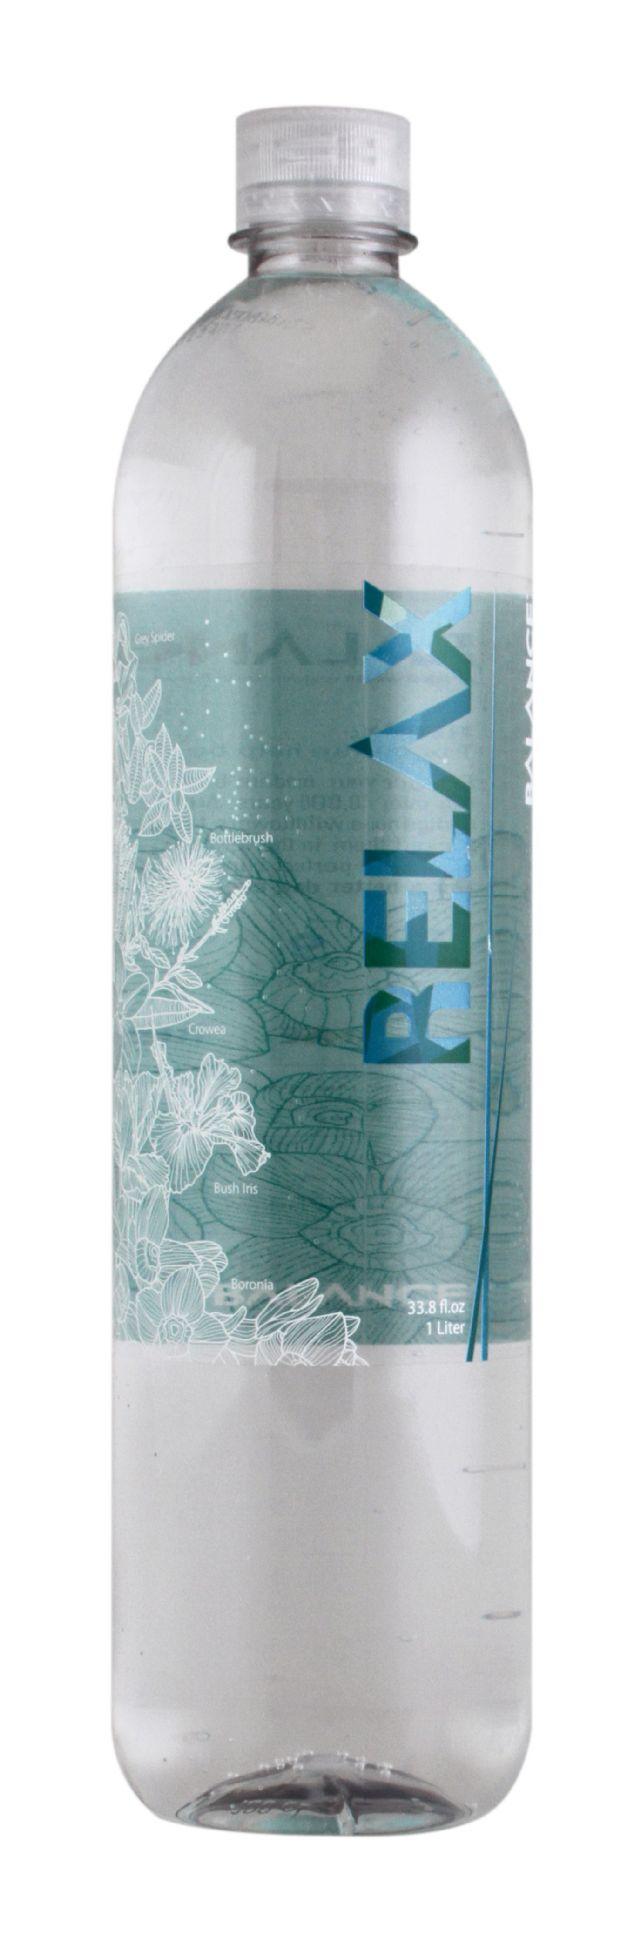 Balance Water: Balance Relax Front